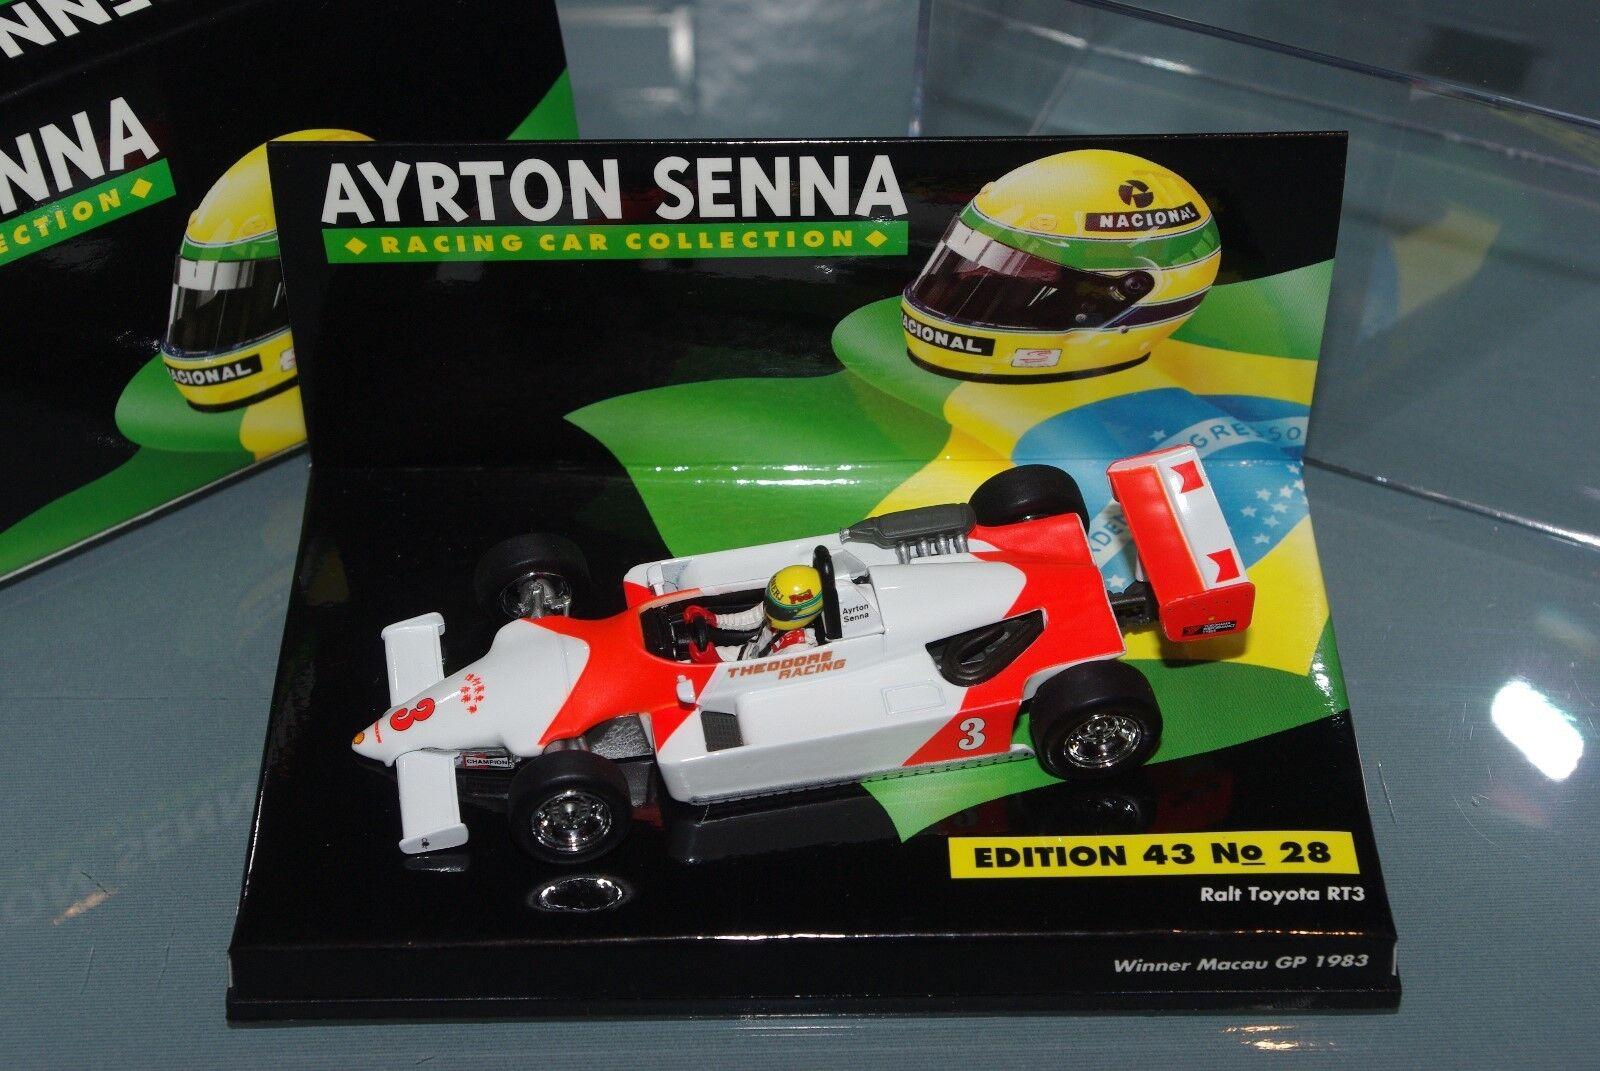 Minichamps F3 1 43 RALT TOYOTA RT3 WINNER MACAU GP 1983 SENNA COLLECTION  28